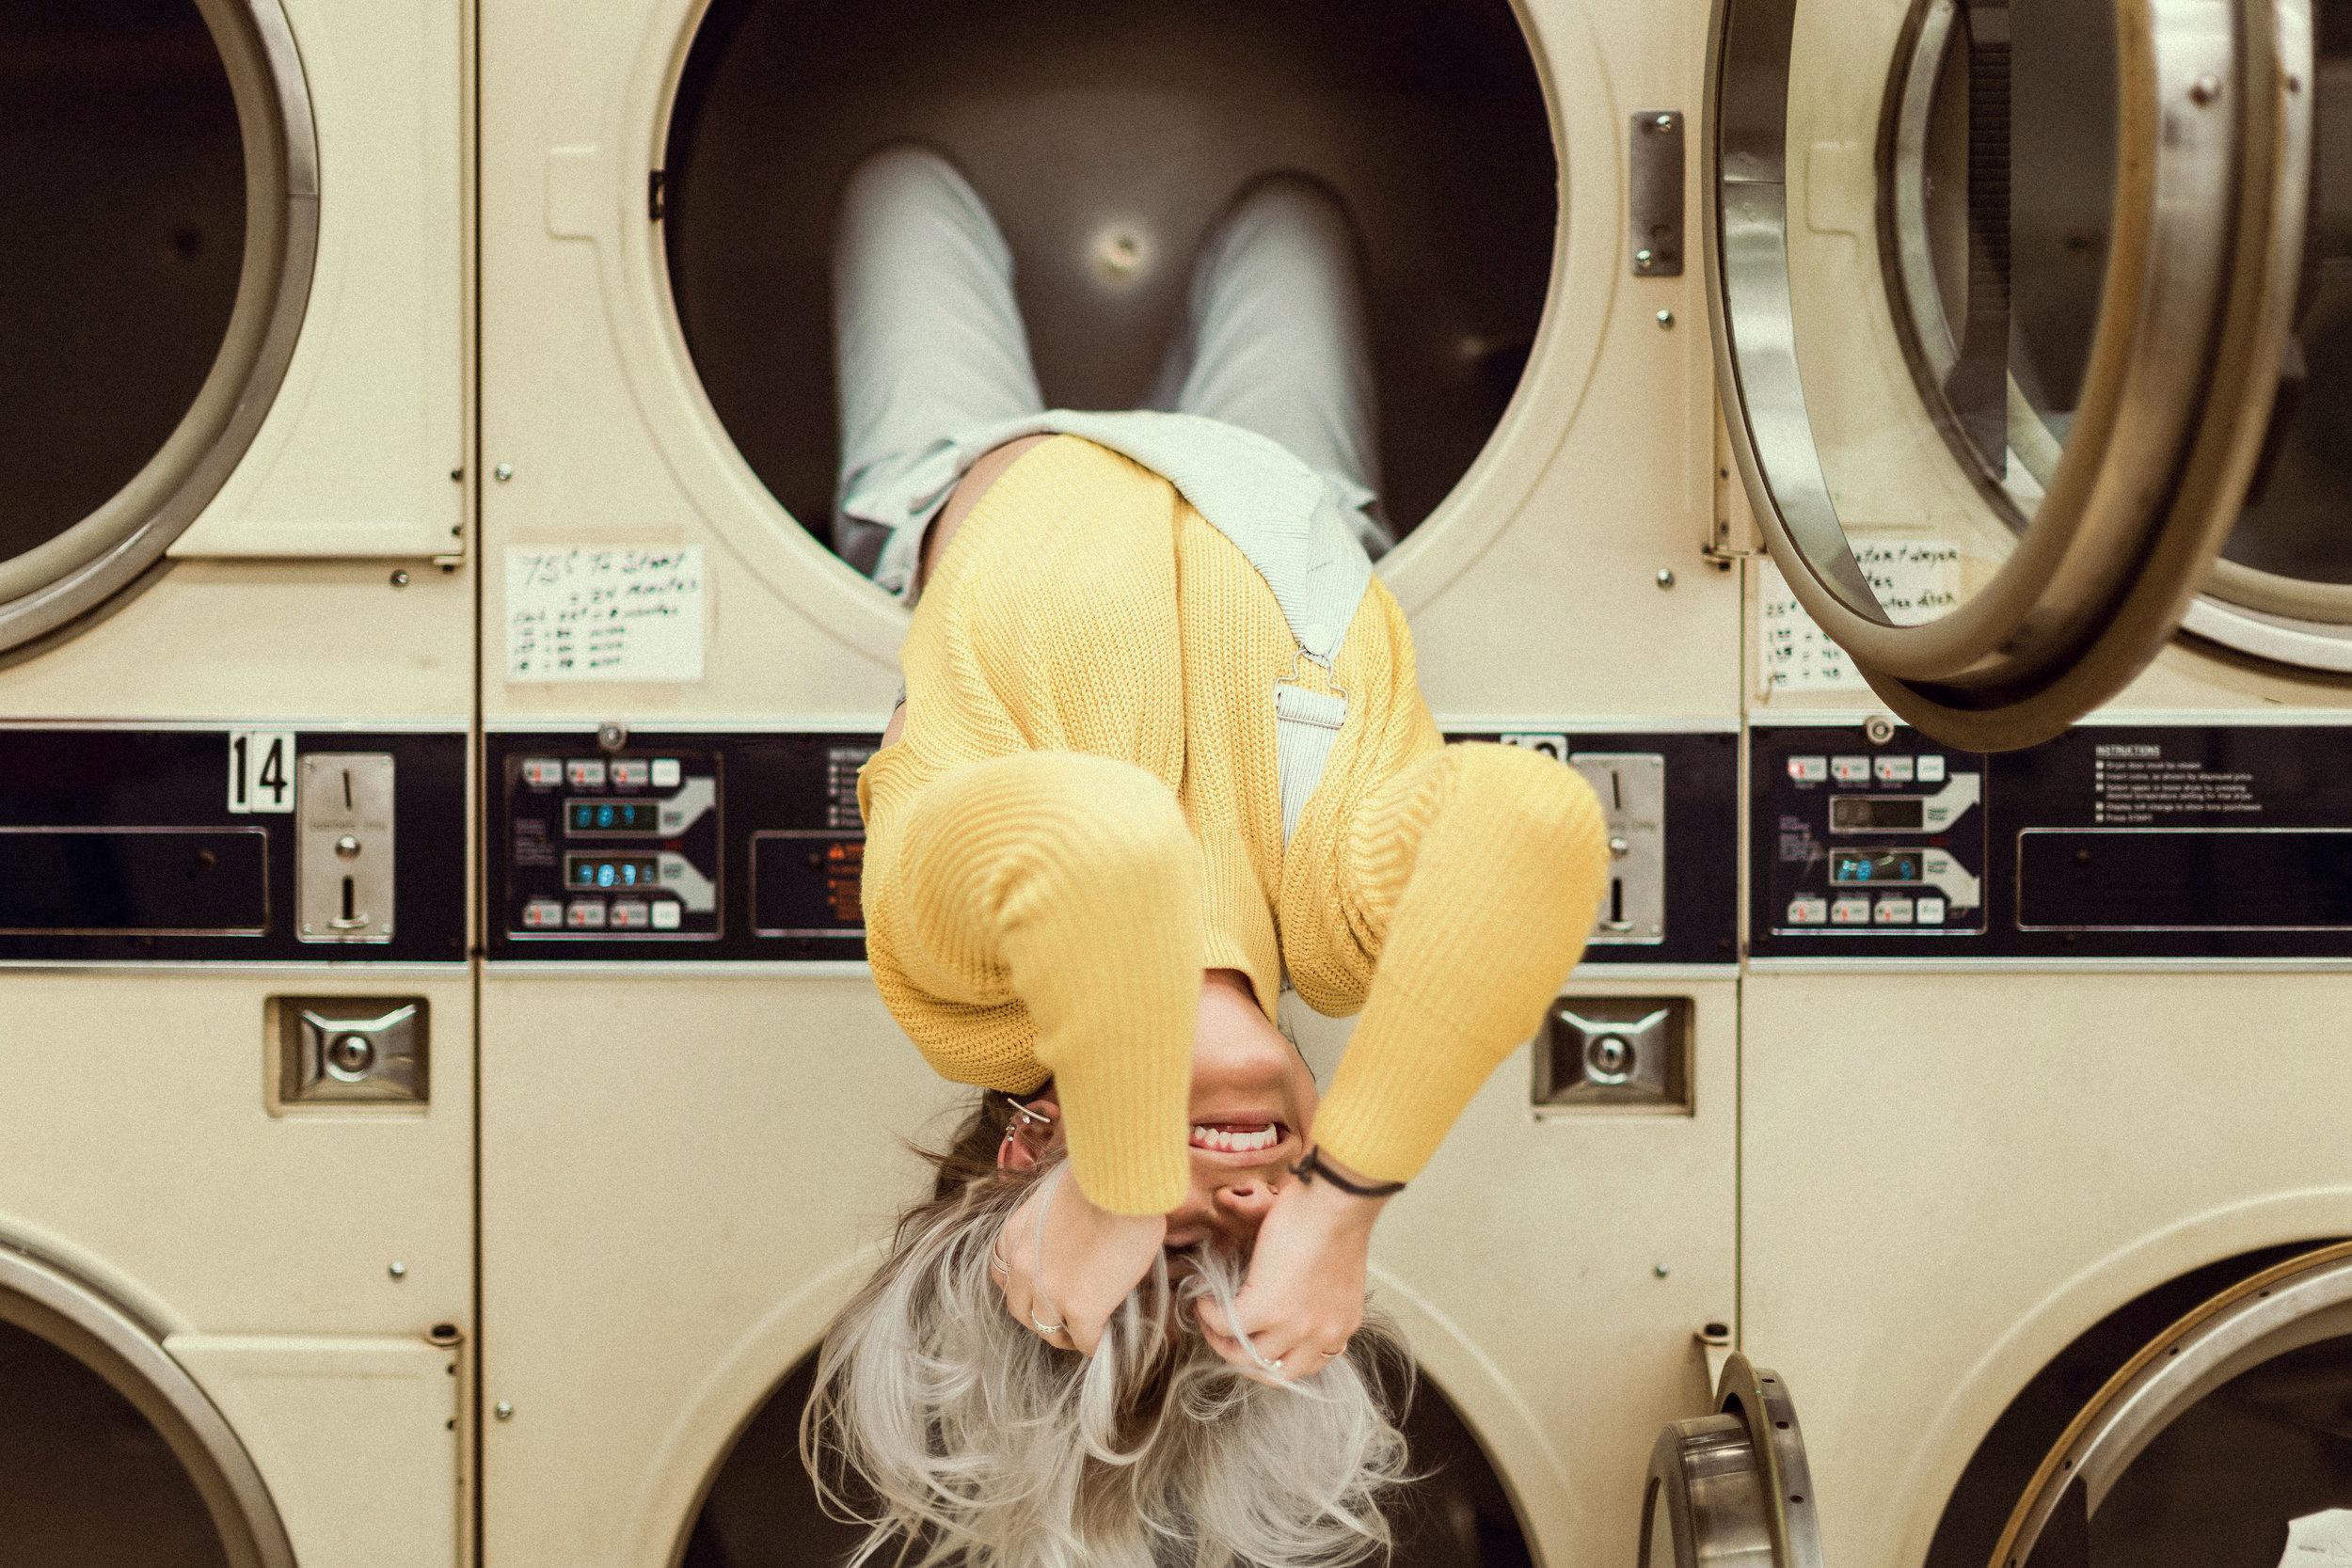 20170226-laundry.jpg